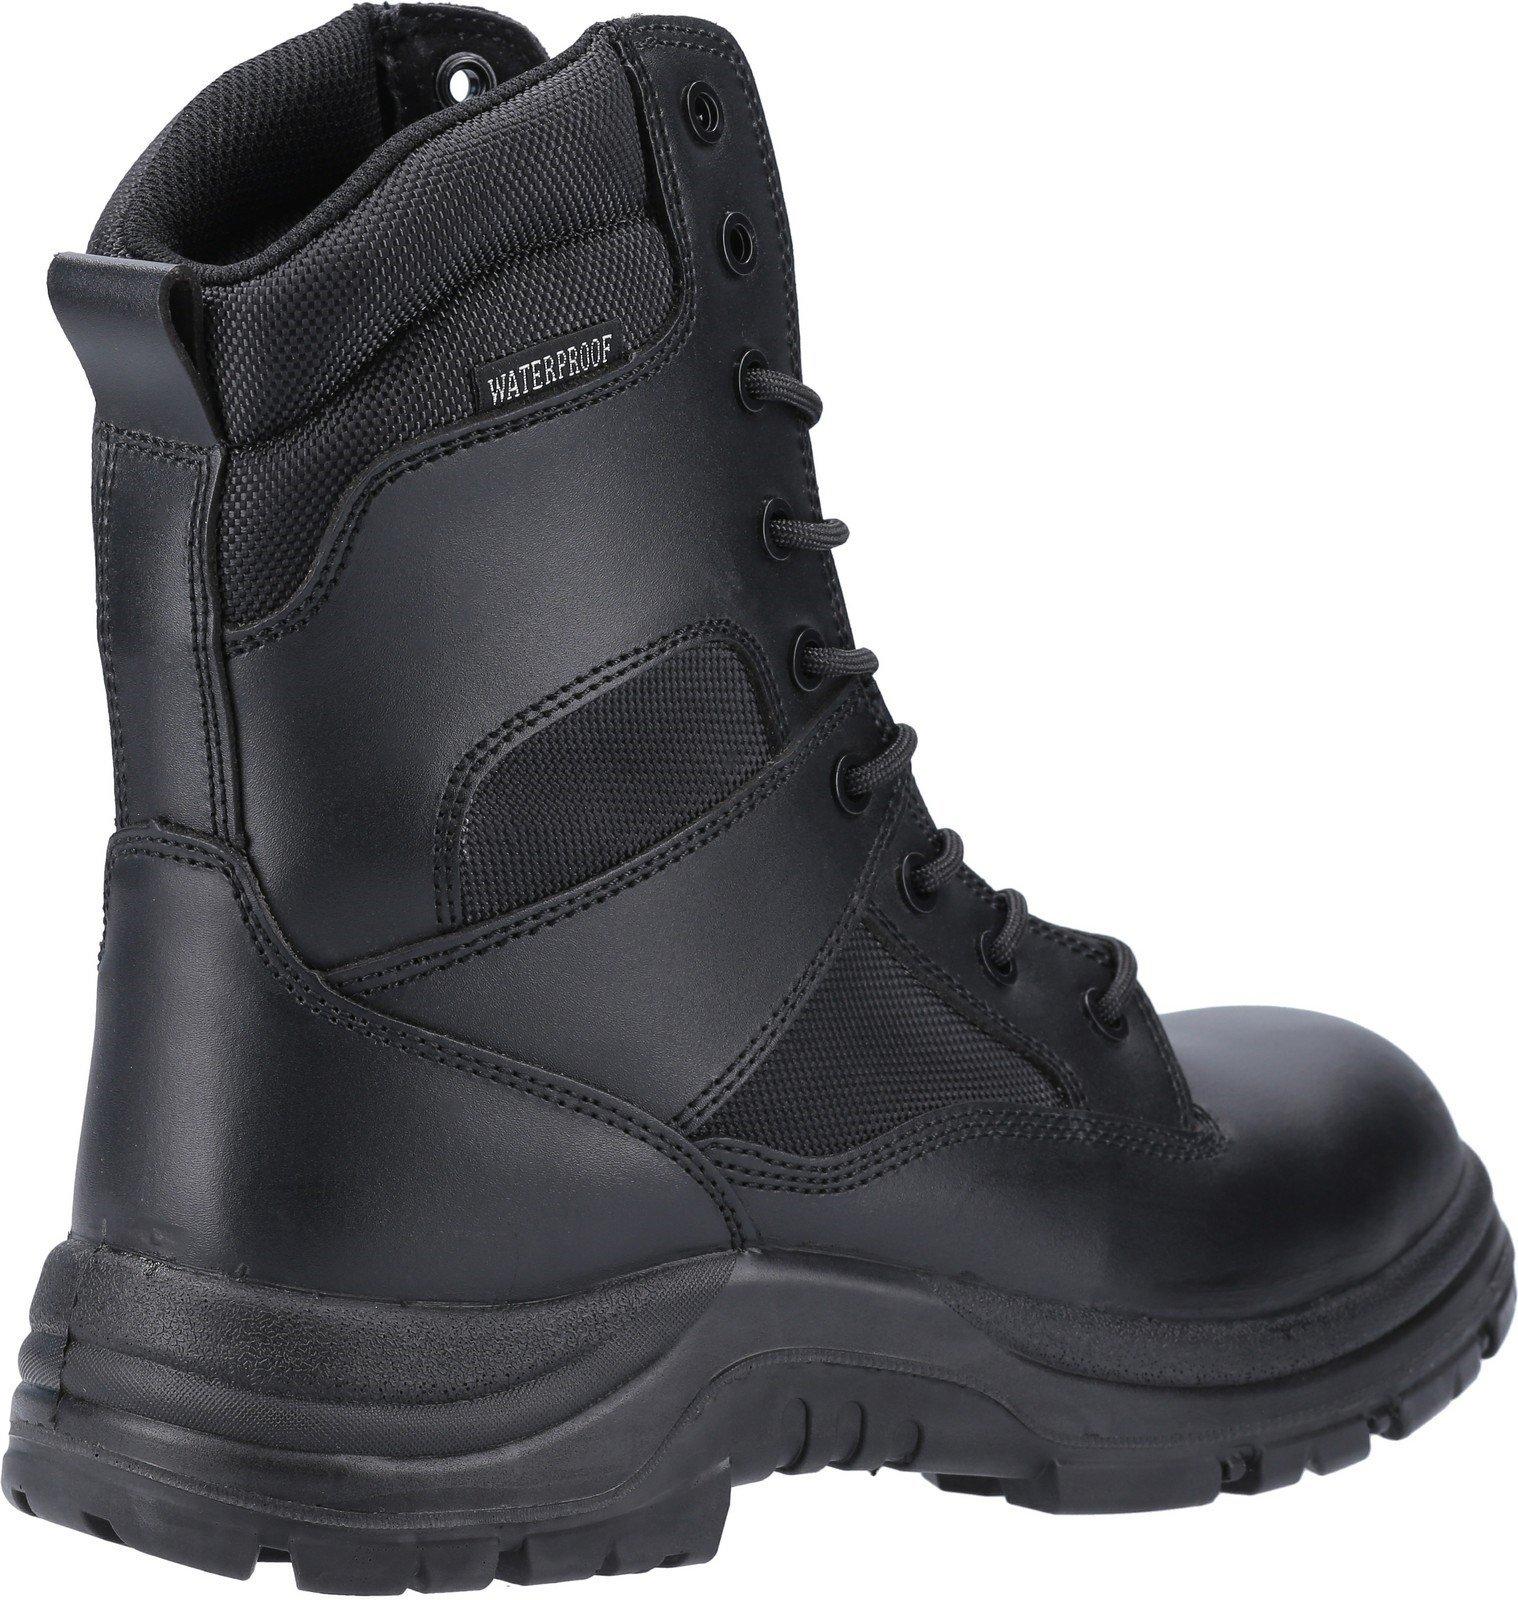 Amblers Unisex Safety Combat Hi-Leg Waterproof Boot Black 20417 - Black 4